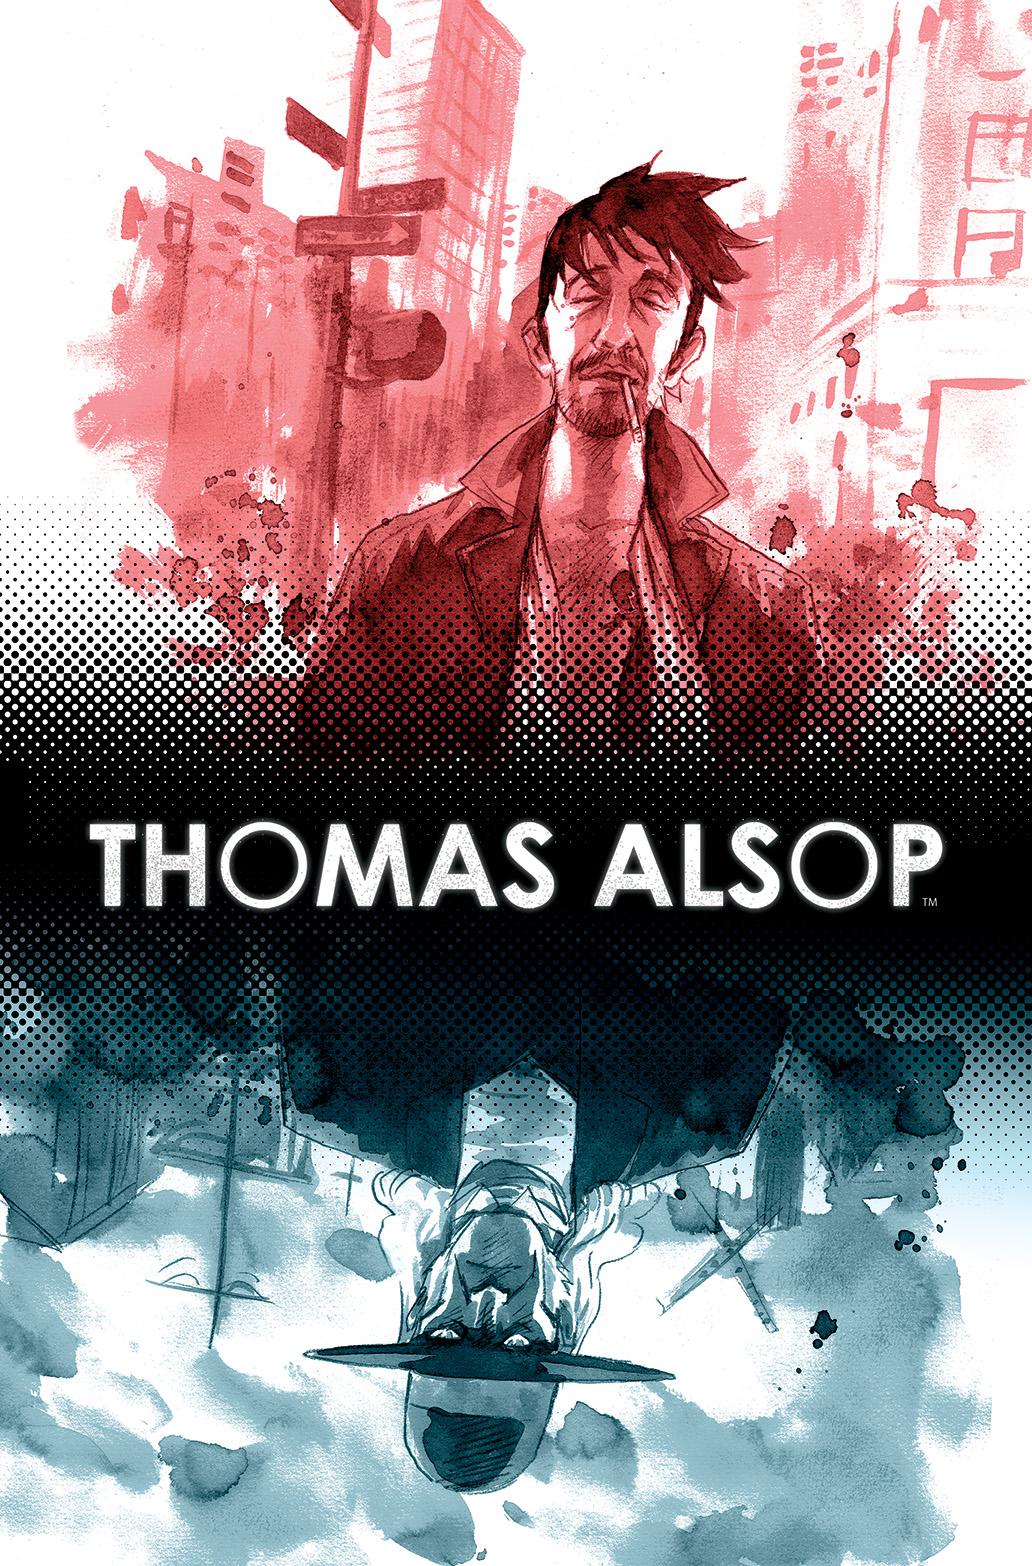 THOMAS ALSOP #1 Cover A by Palle Schmidt